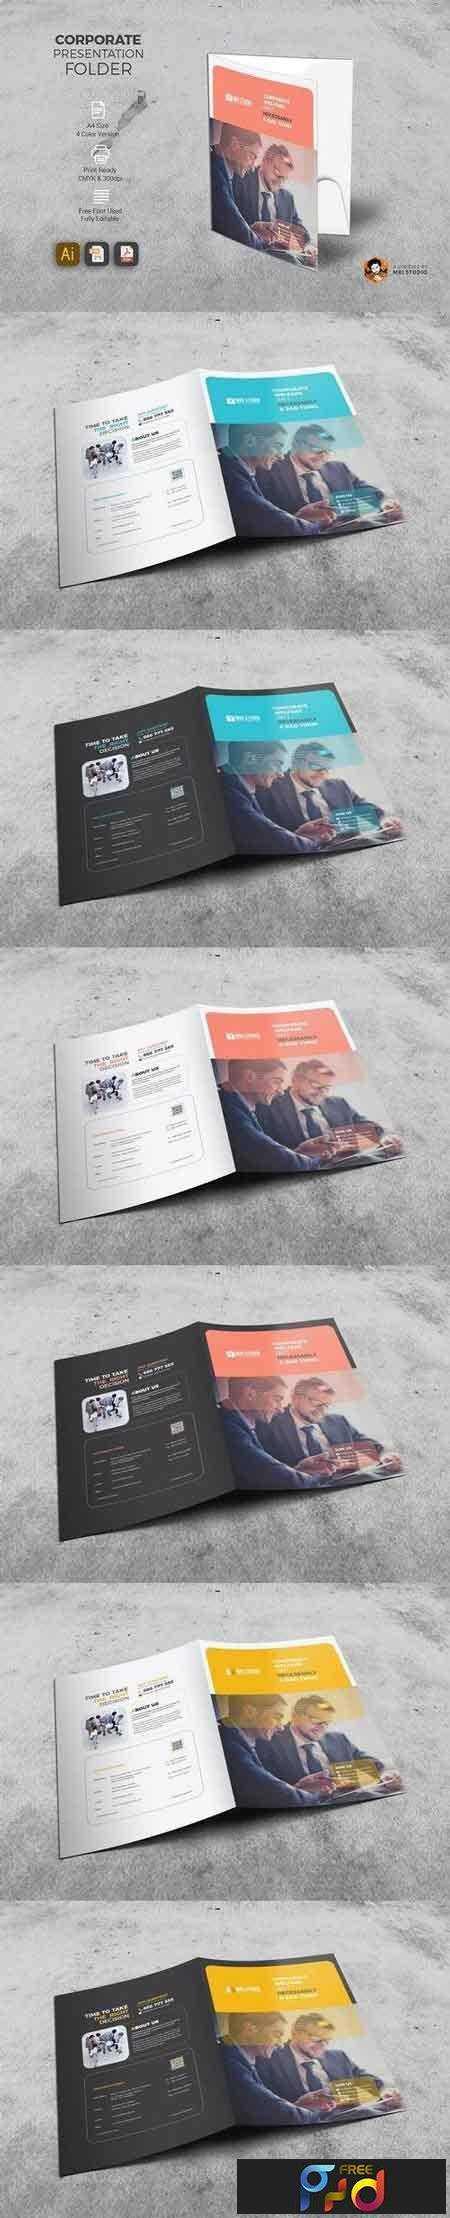 1709265 Presentation Folder Template 1488857 1